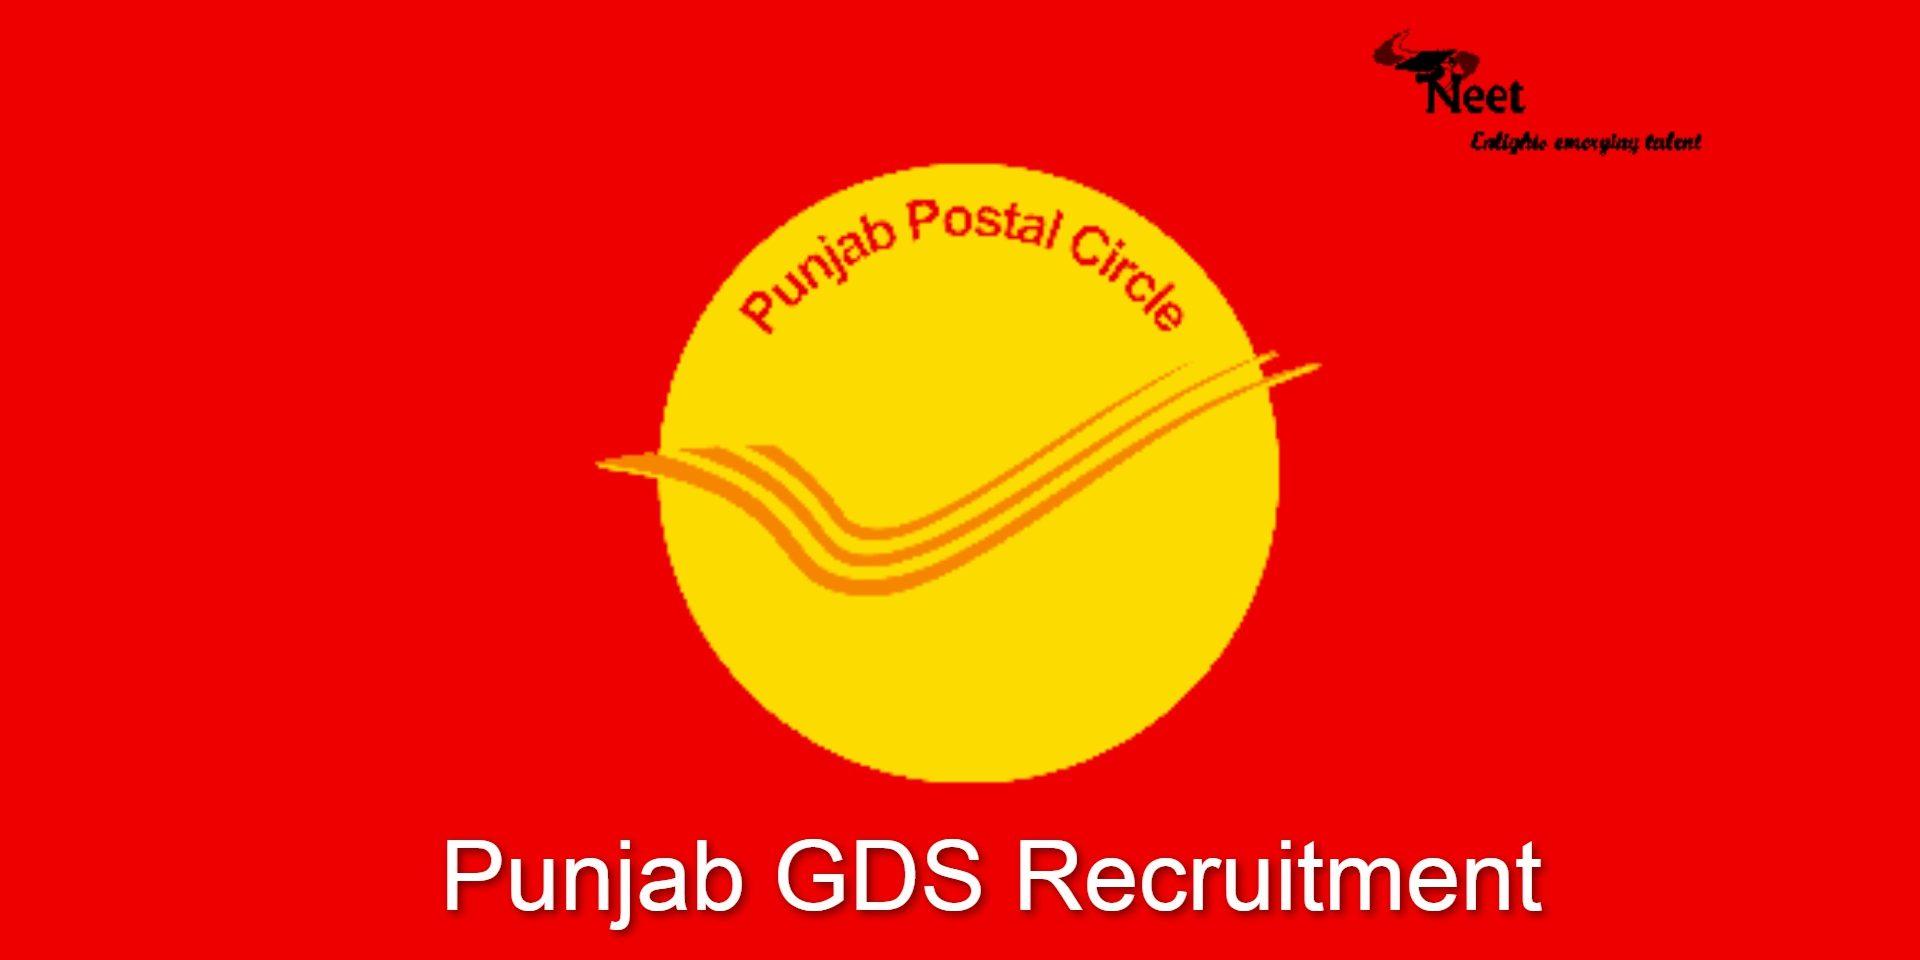 Punjab postal recruitment2020